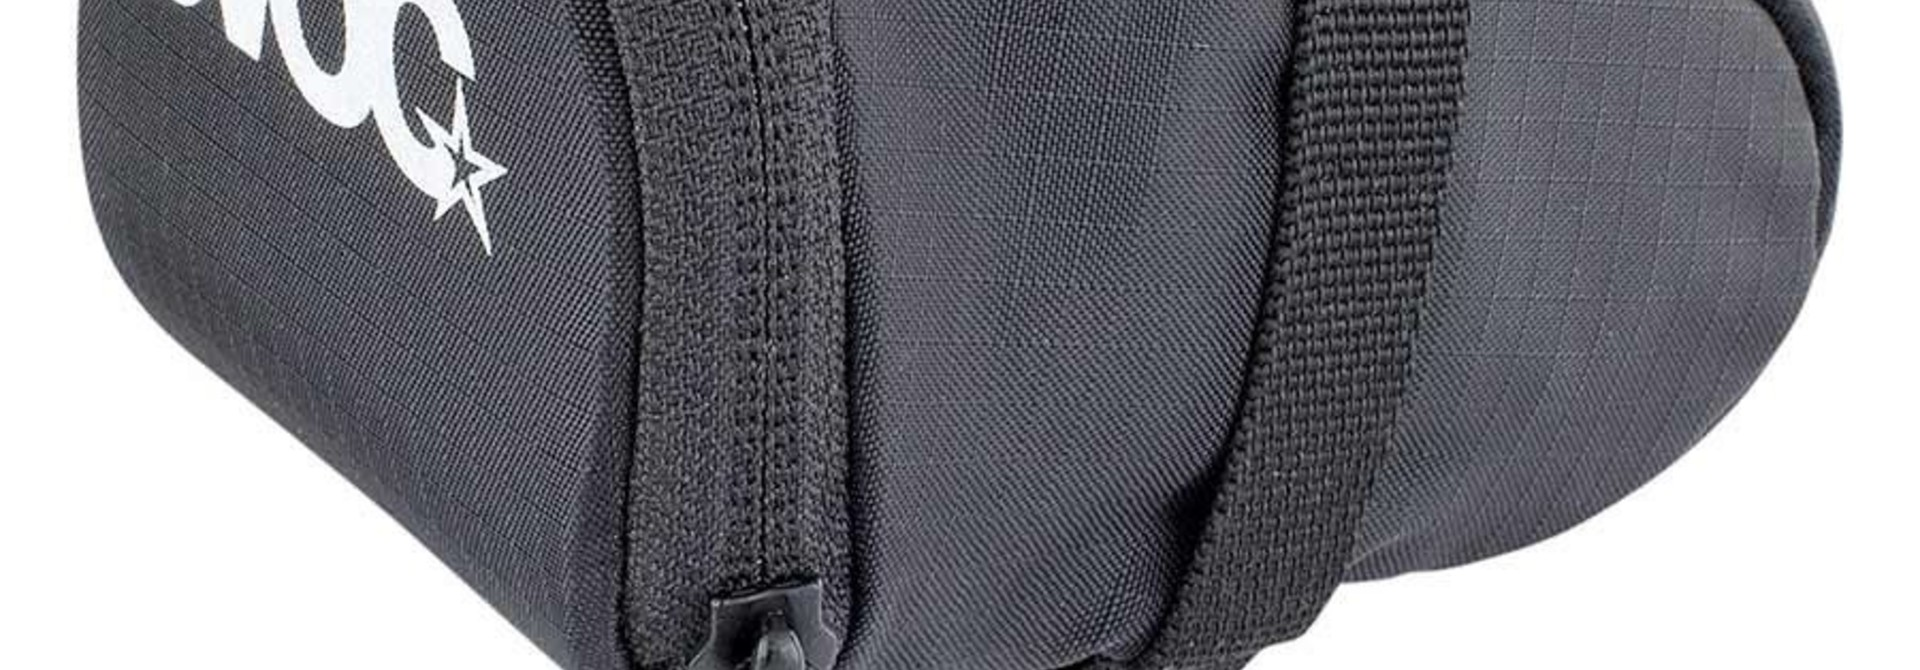 Evoc Seat Bag Black